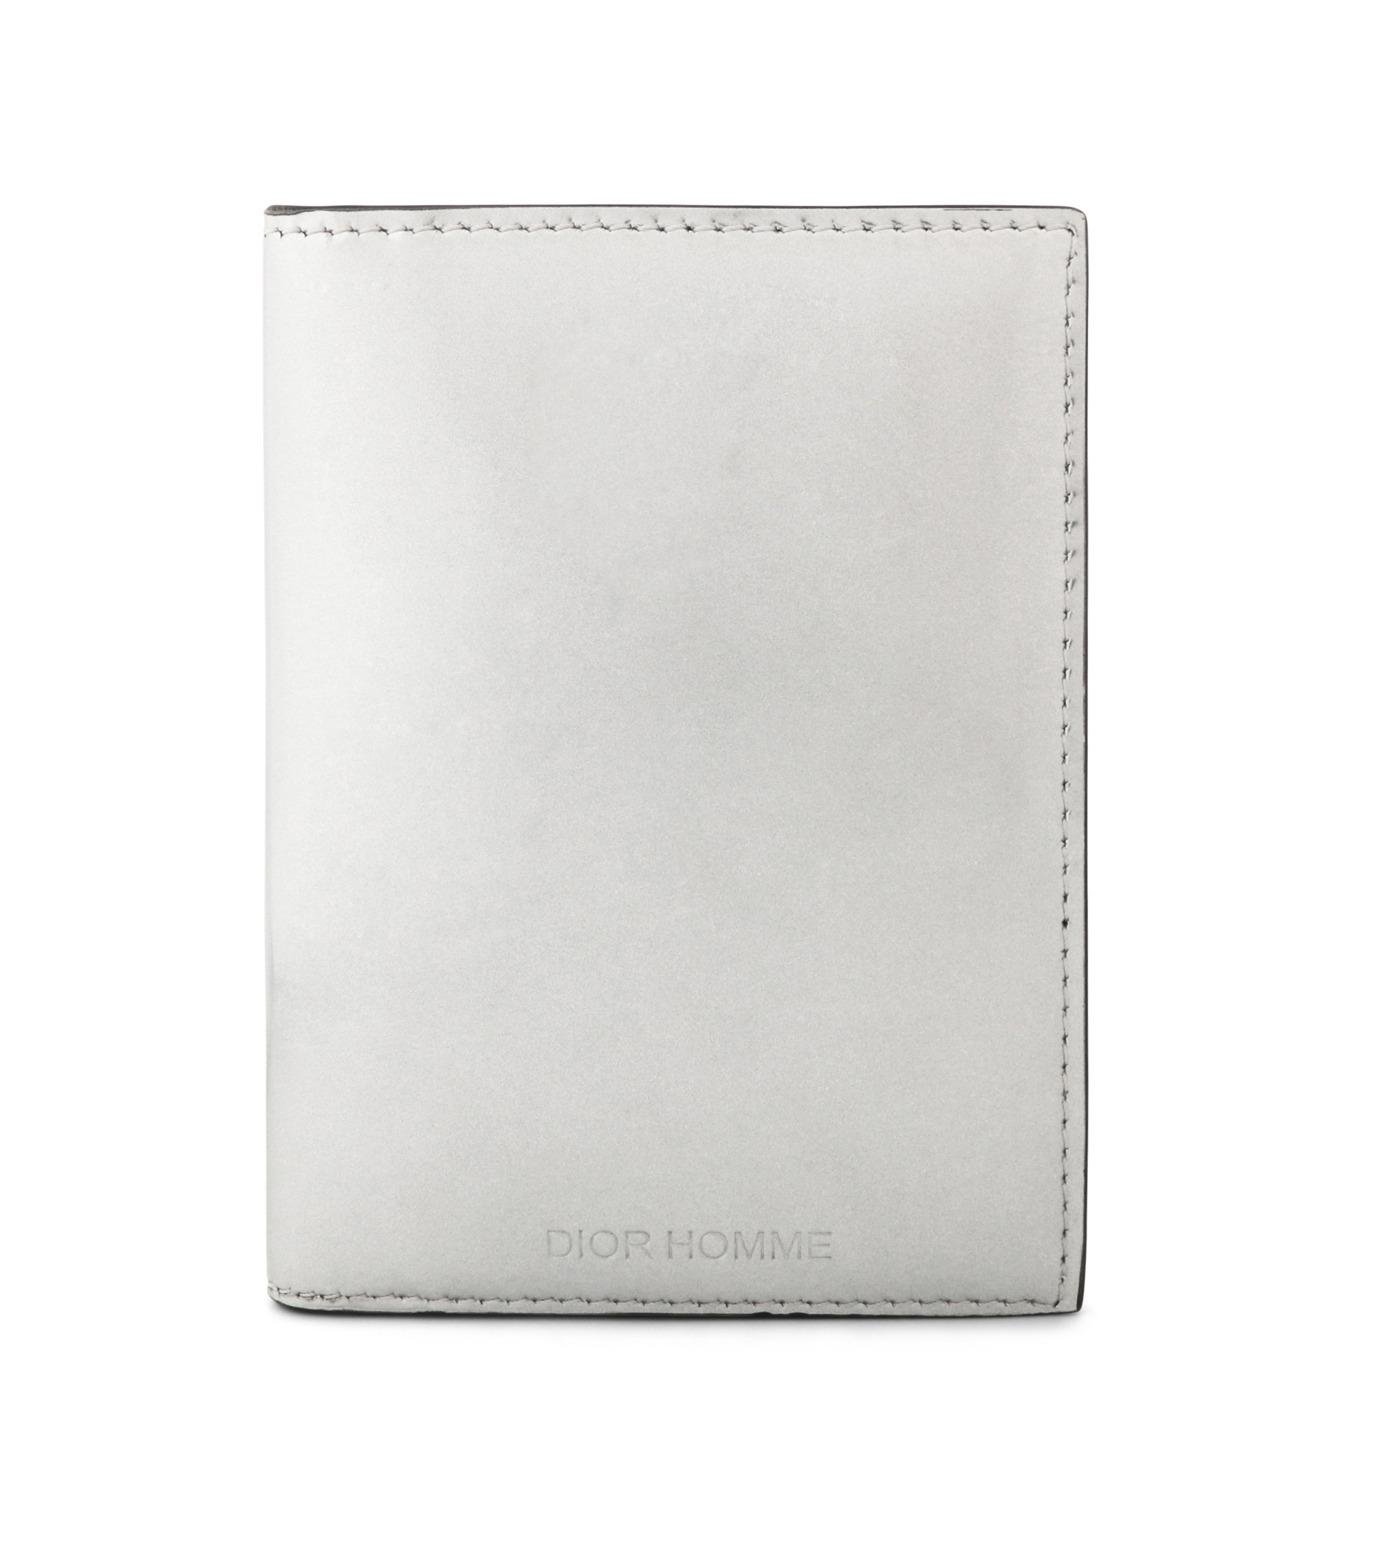 Dior Homme(ディオール オム)のSilver Card Case-SILVER-2DECH002XJD-1 拡大詳細画像1